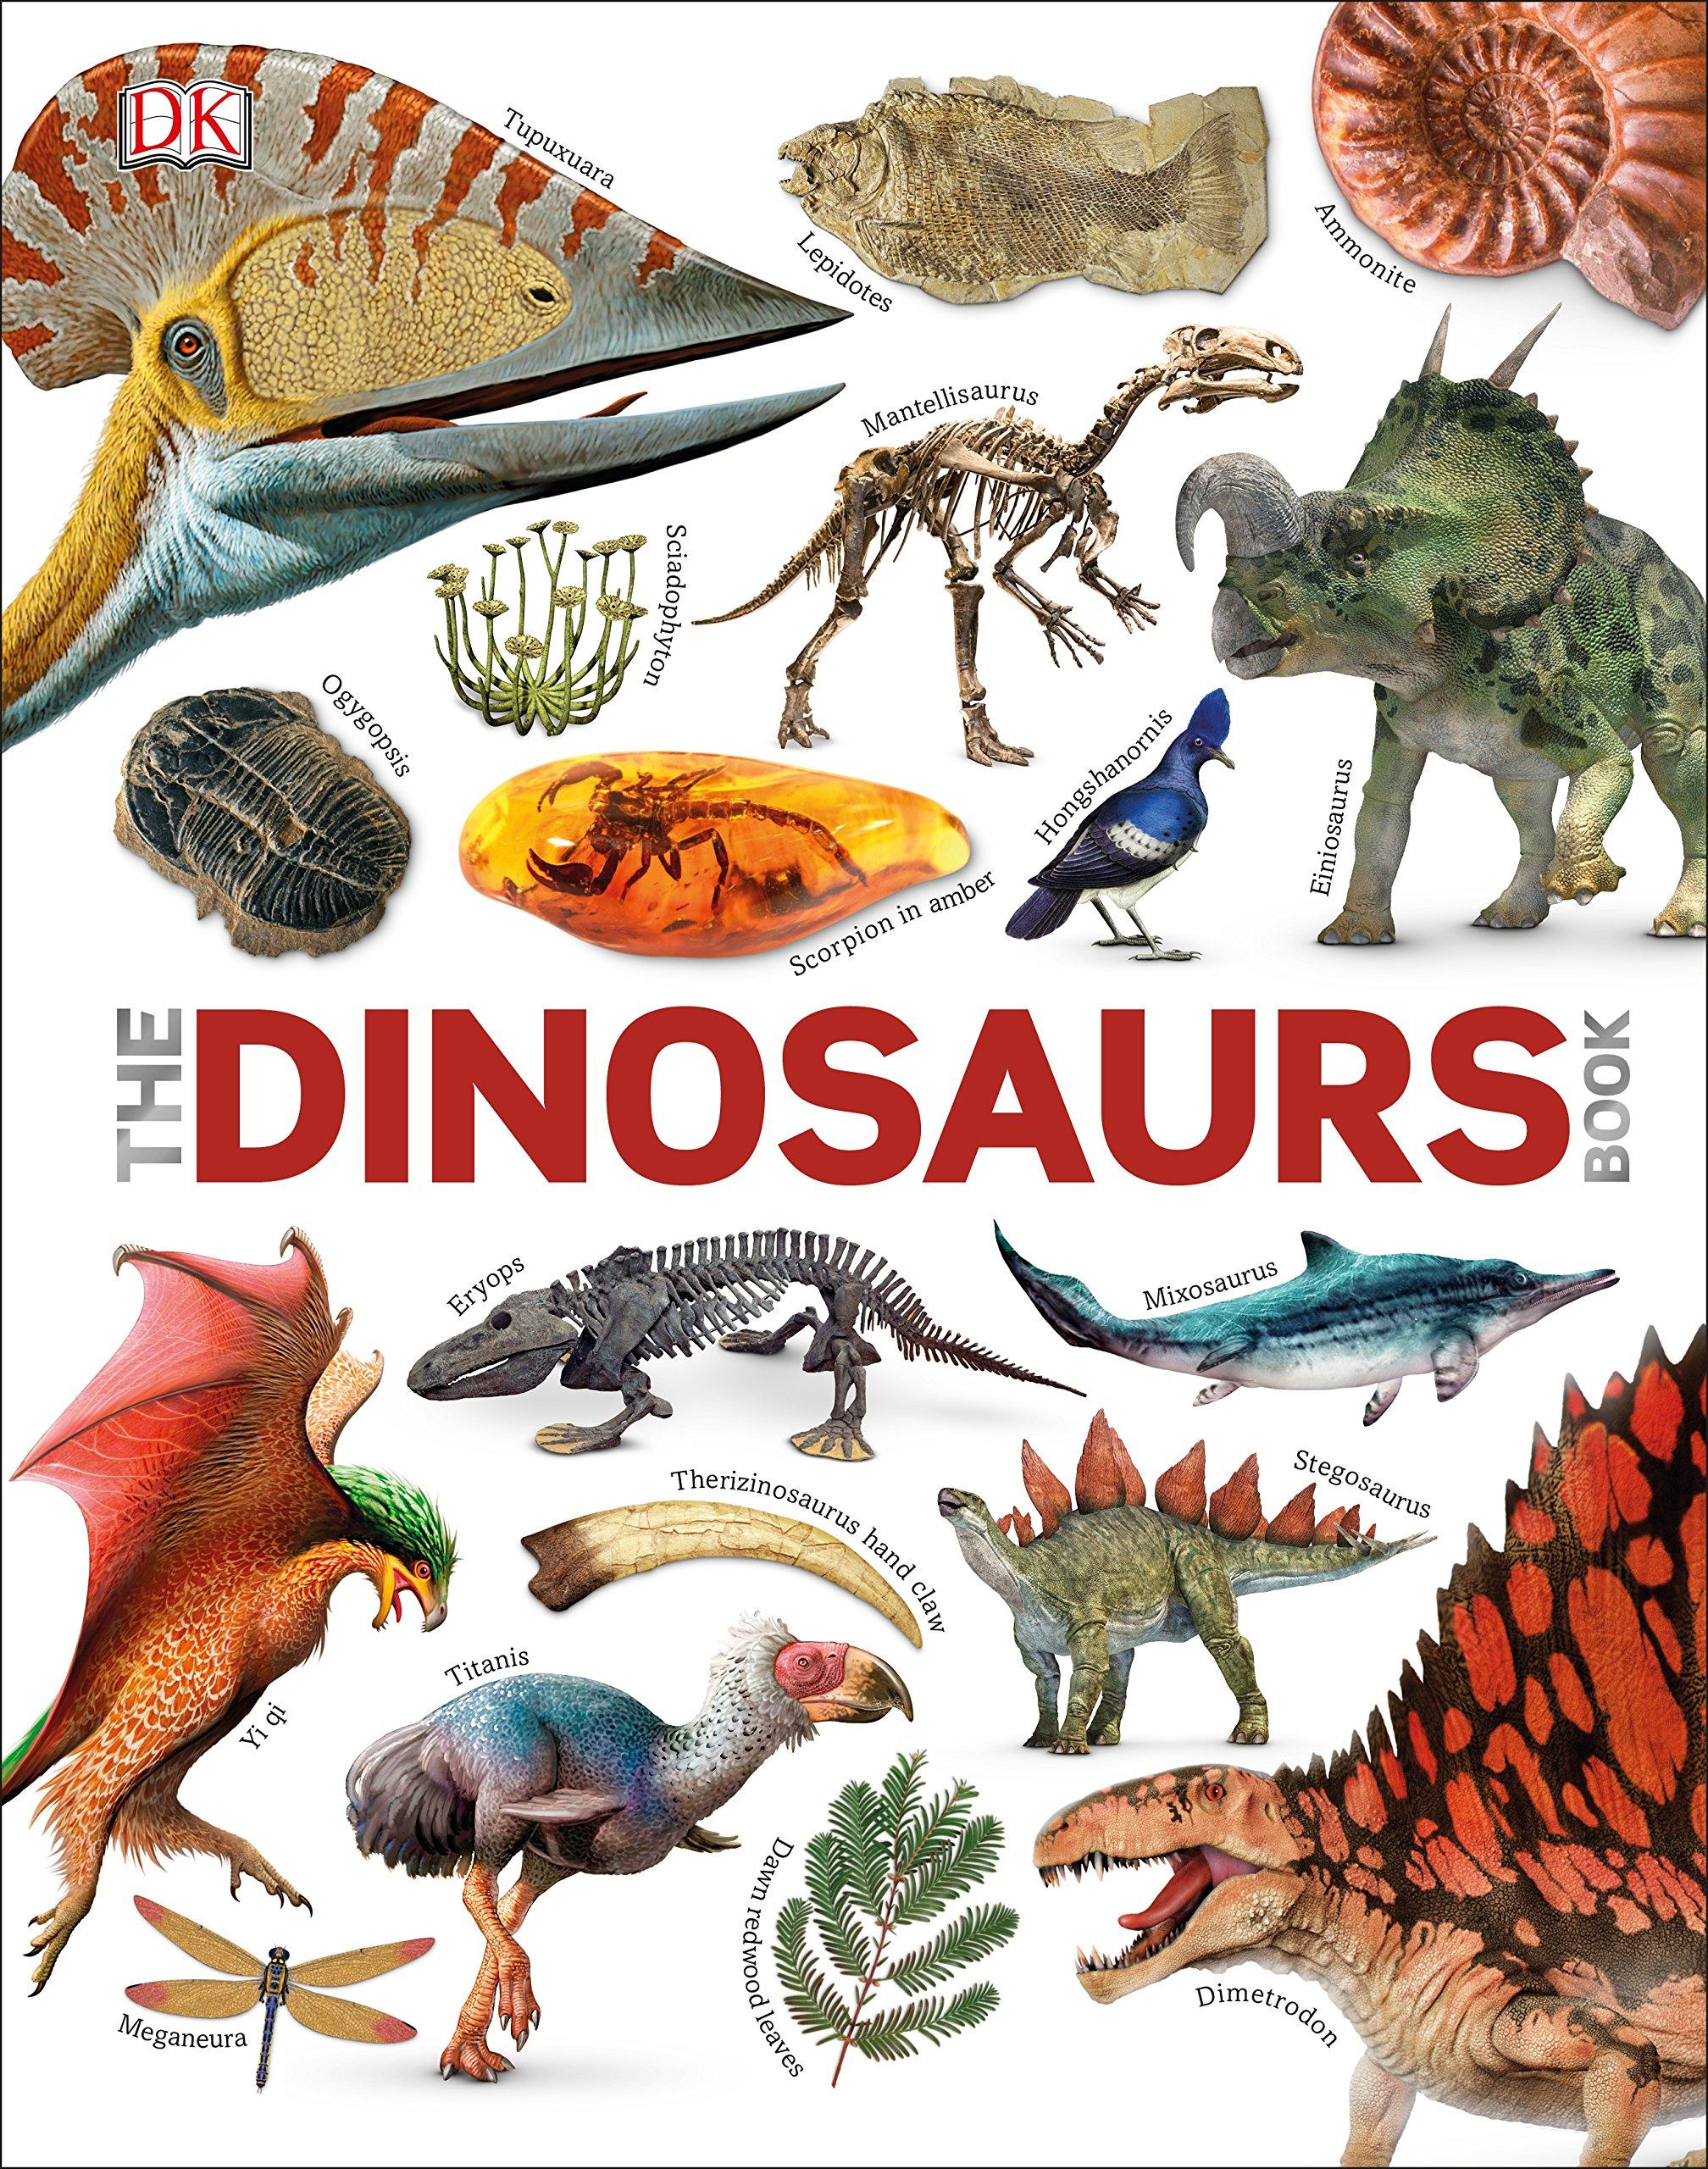 The Dinosaurs Book (Dk): Amazon.co.uk: DK: 9780241300077: Books